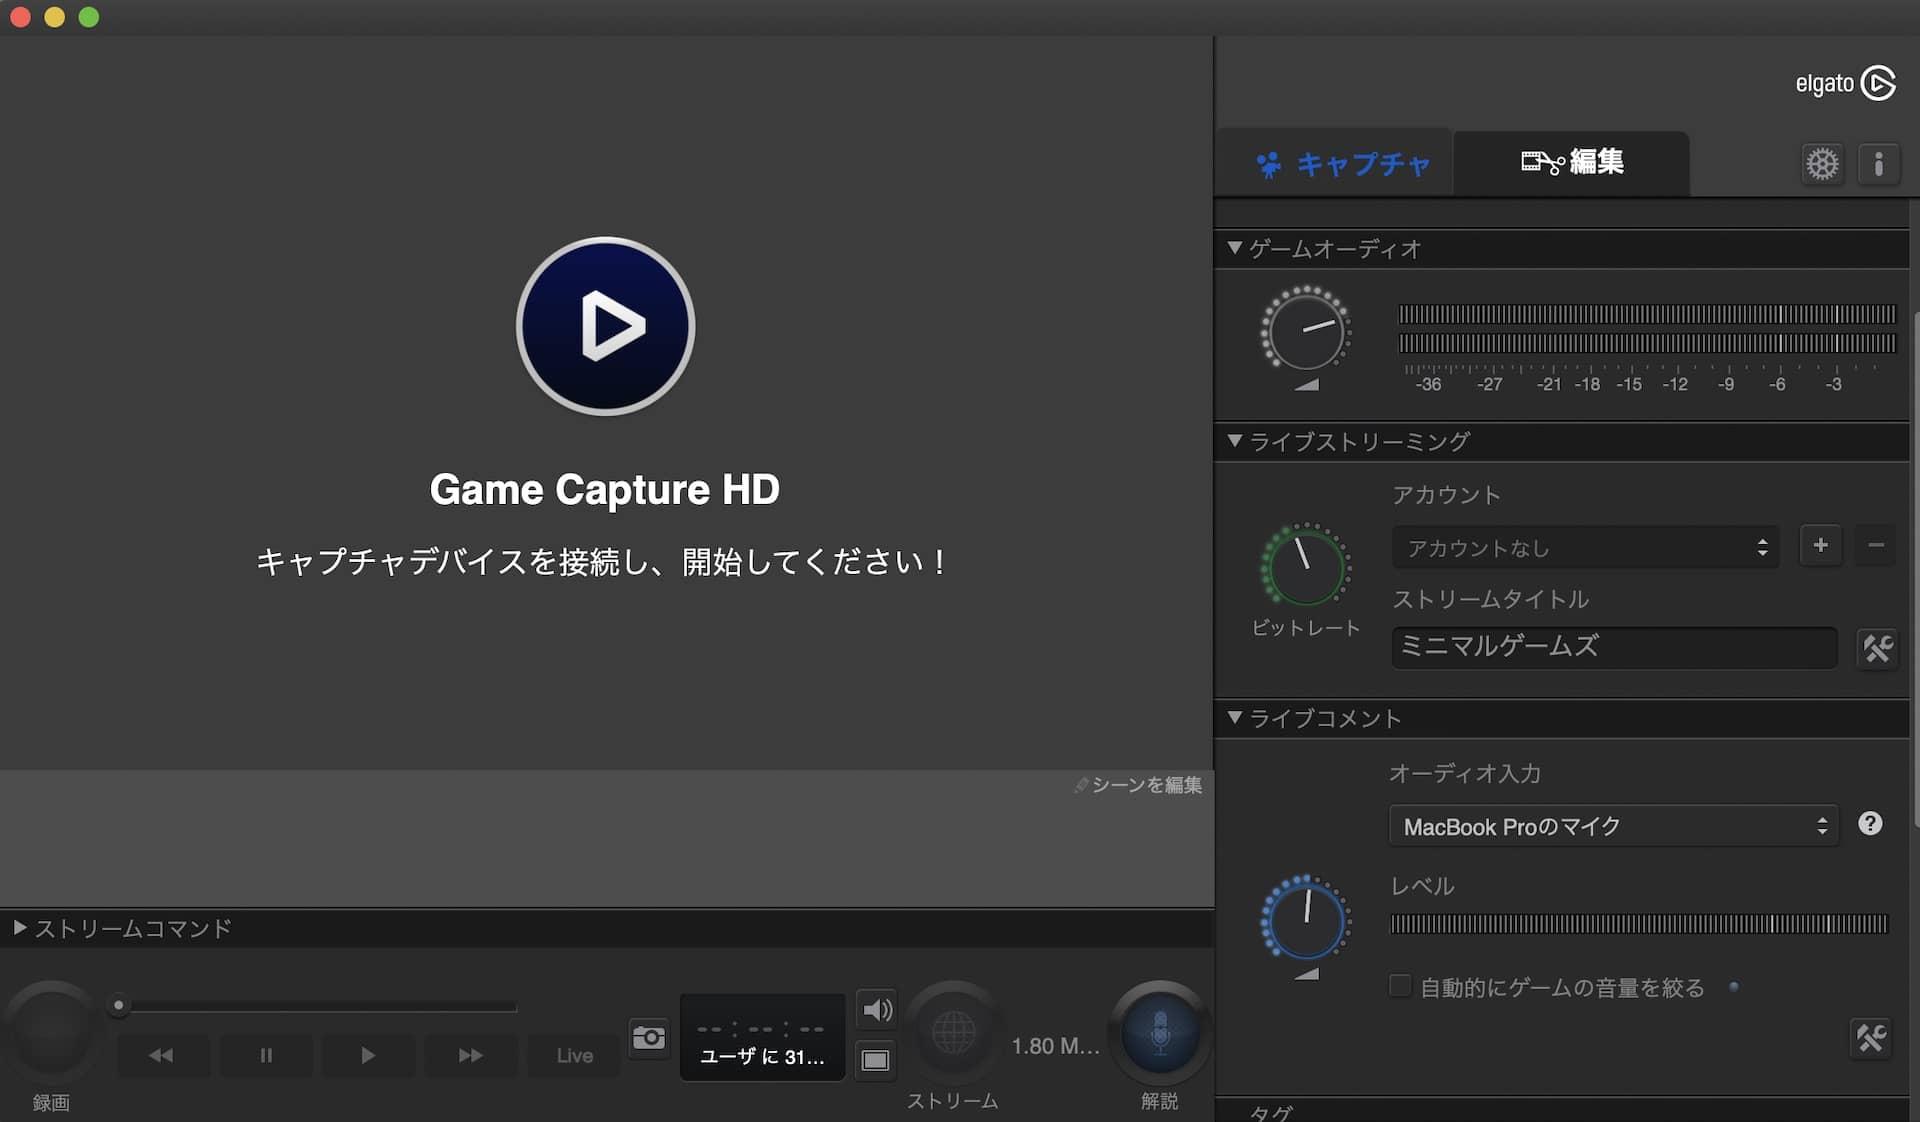 HD60 S付属のキャプチャーソフト「Game Capture HD」